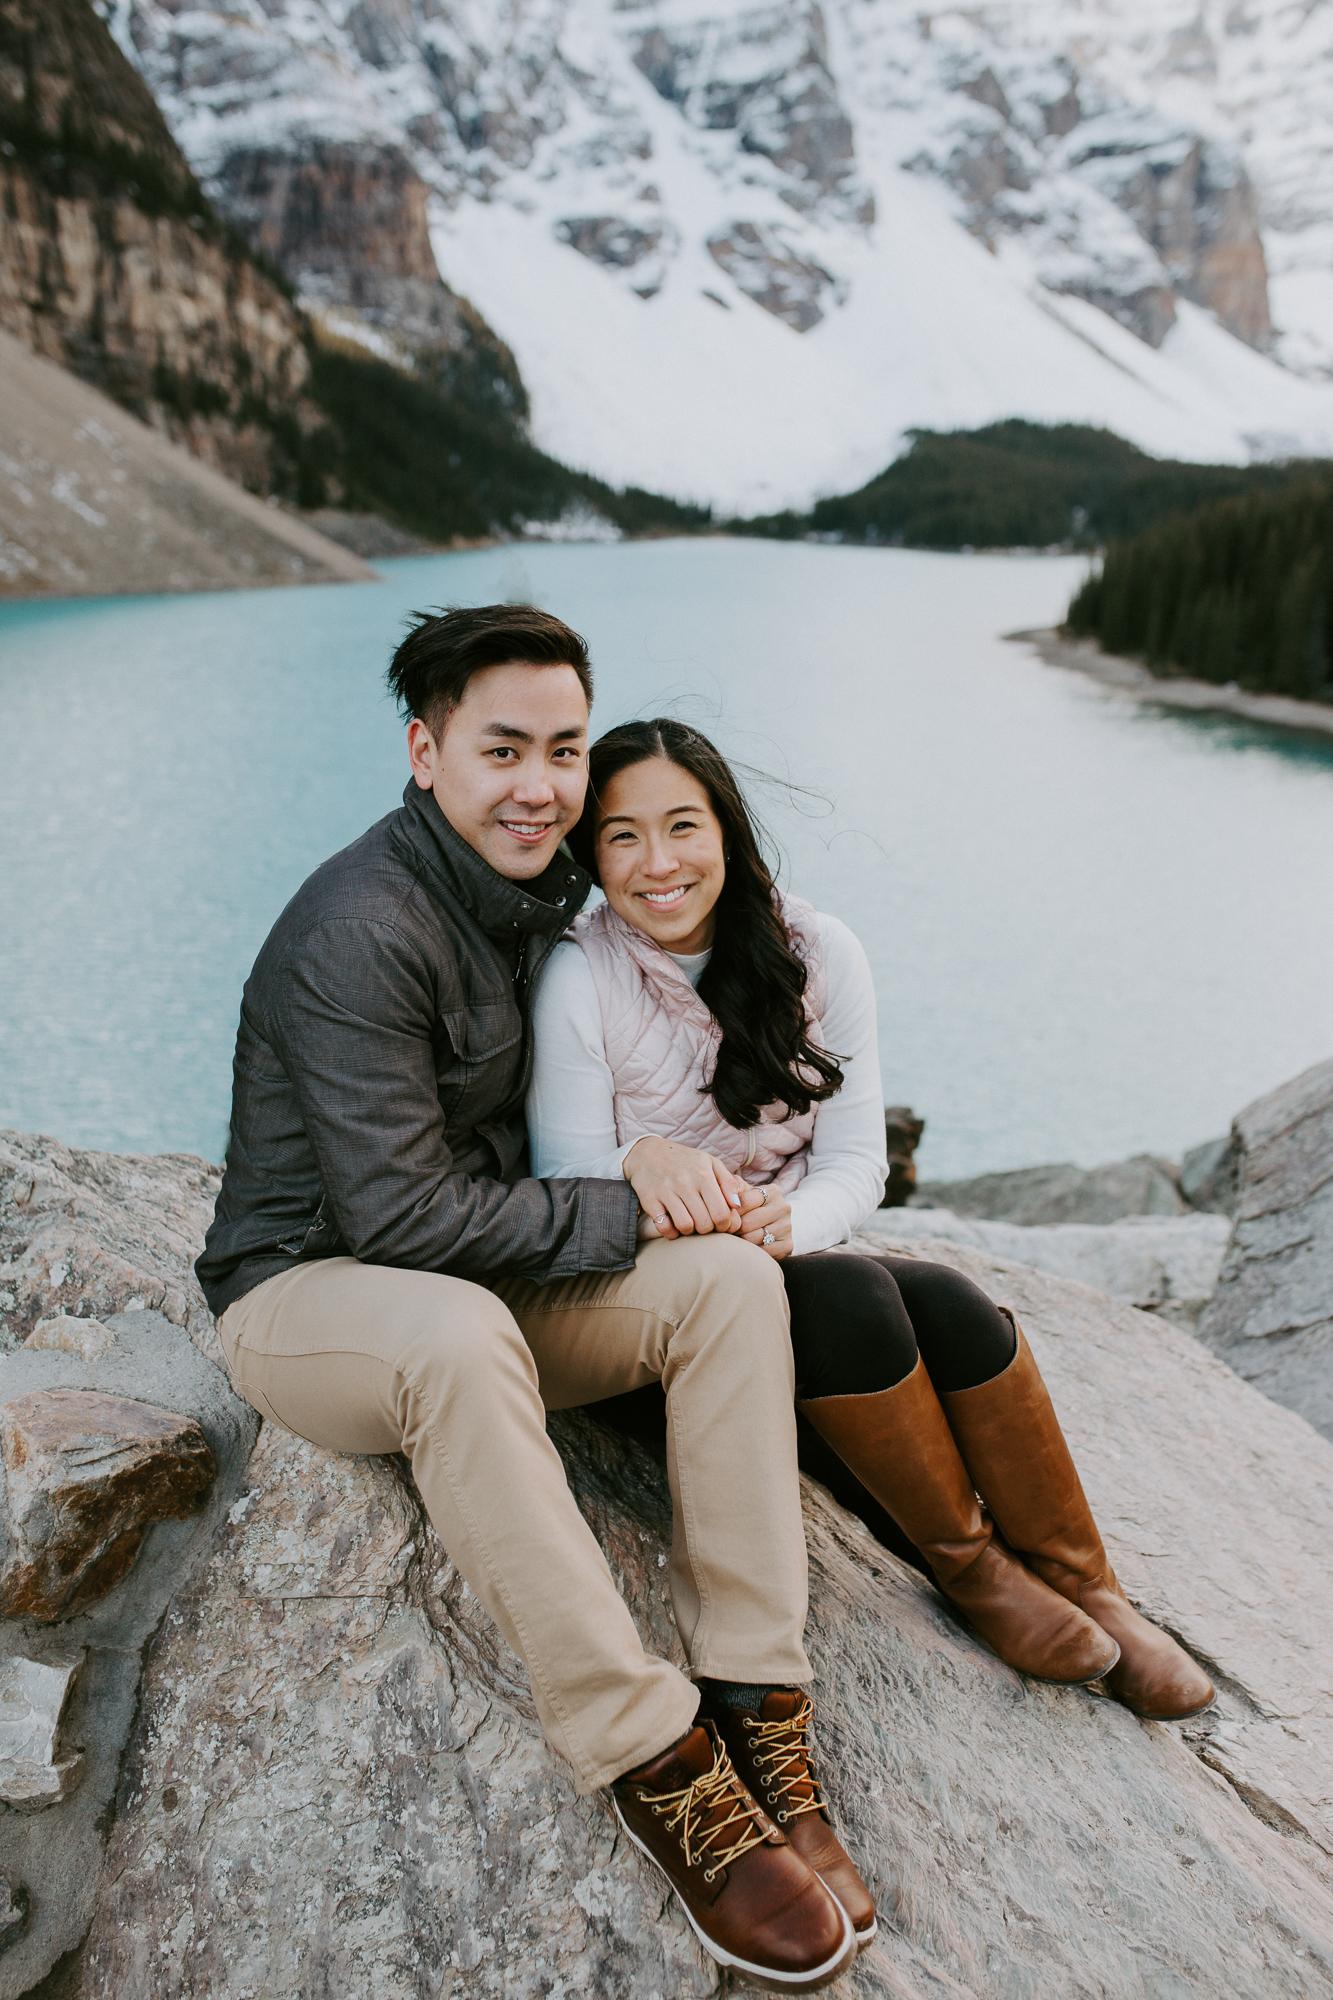 Calgary-wedding-photographer-kj-8.jpg